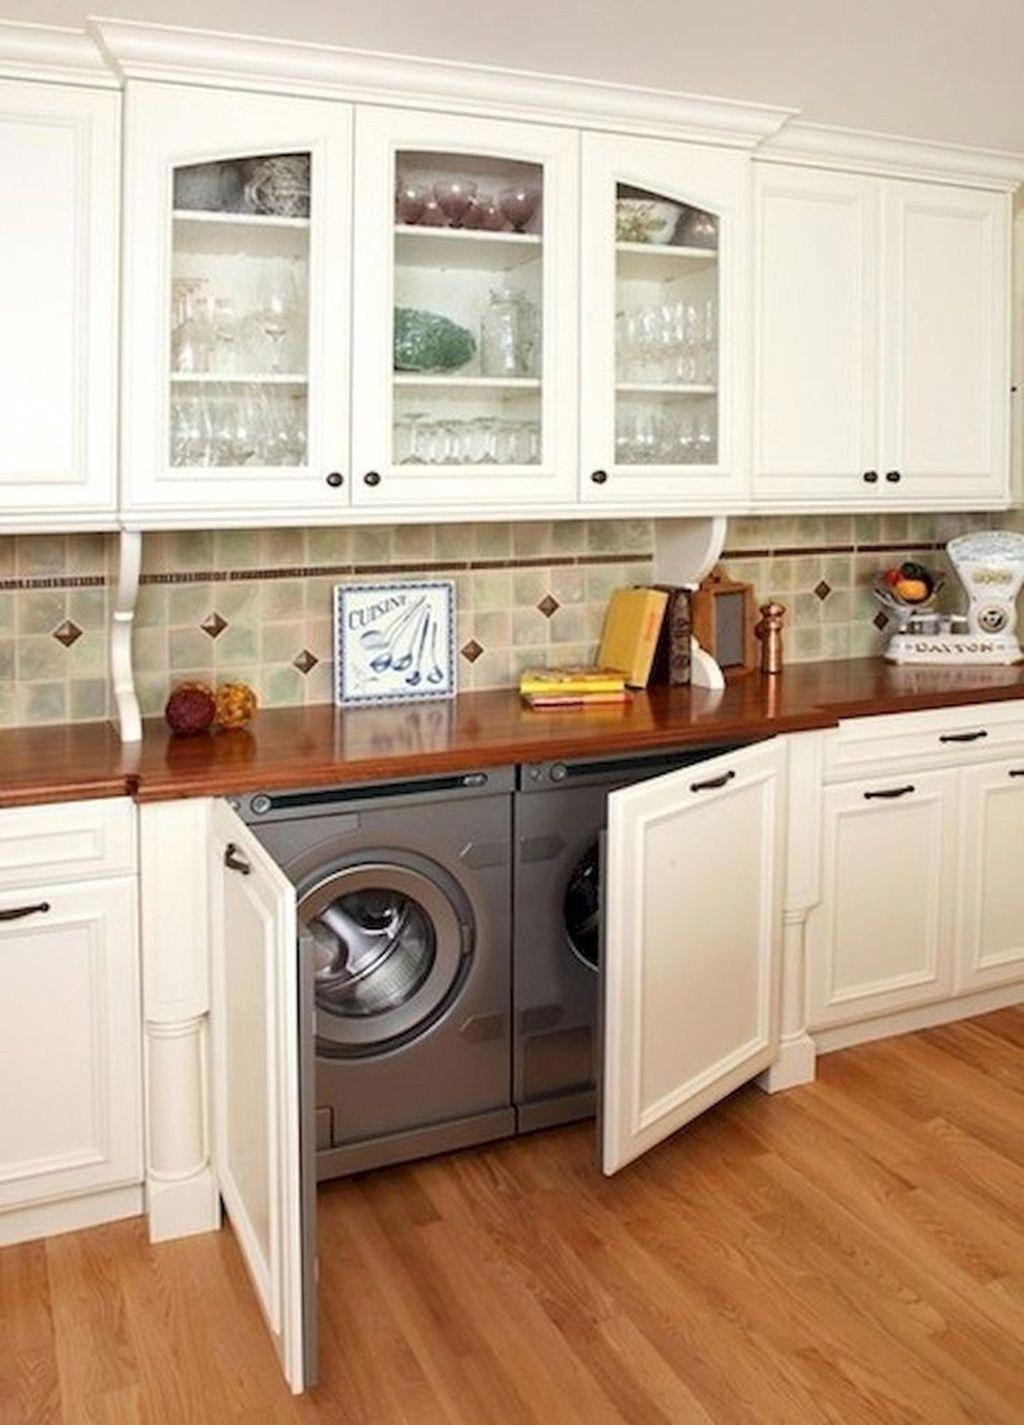 20 unique small house kitchen ideas coodecor in 2020 kitchen design small small house on small kaboodle kitchen ideas id=99801